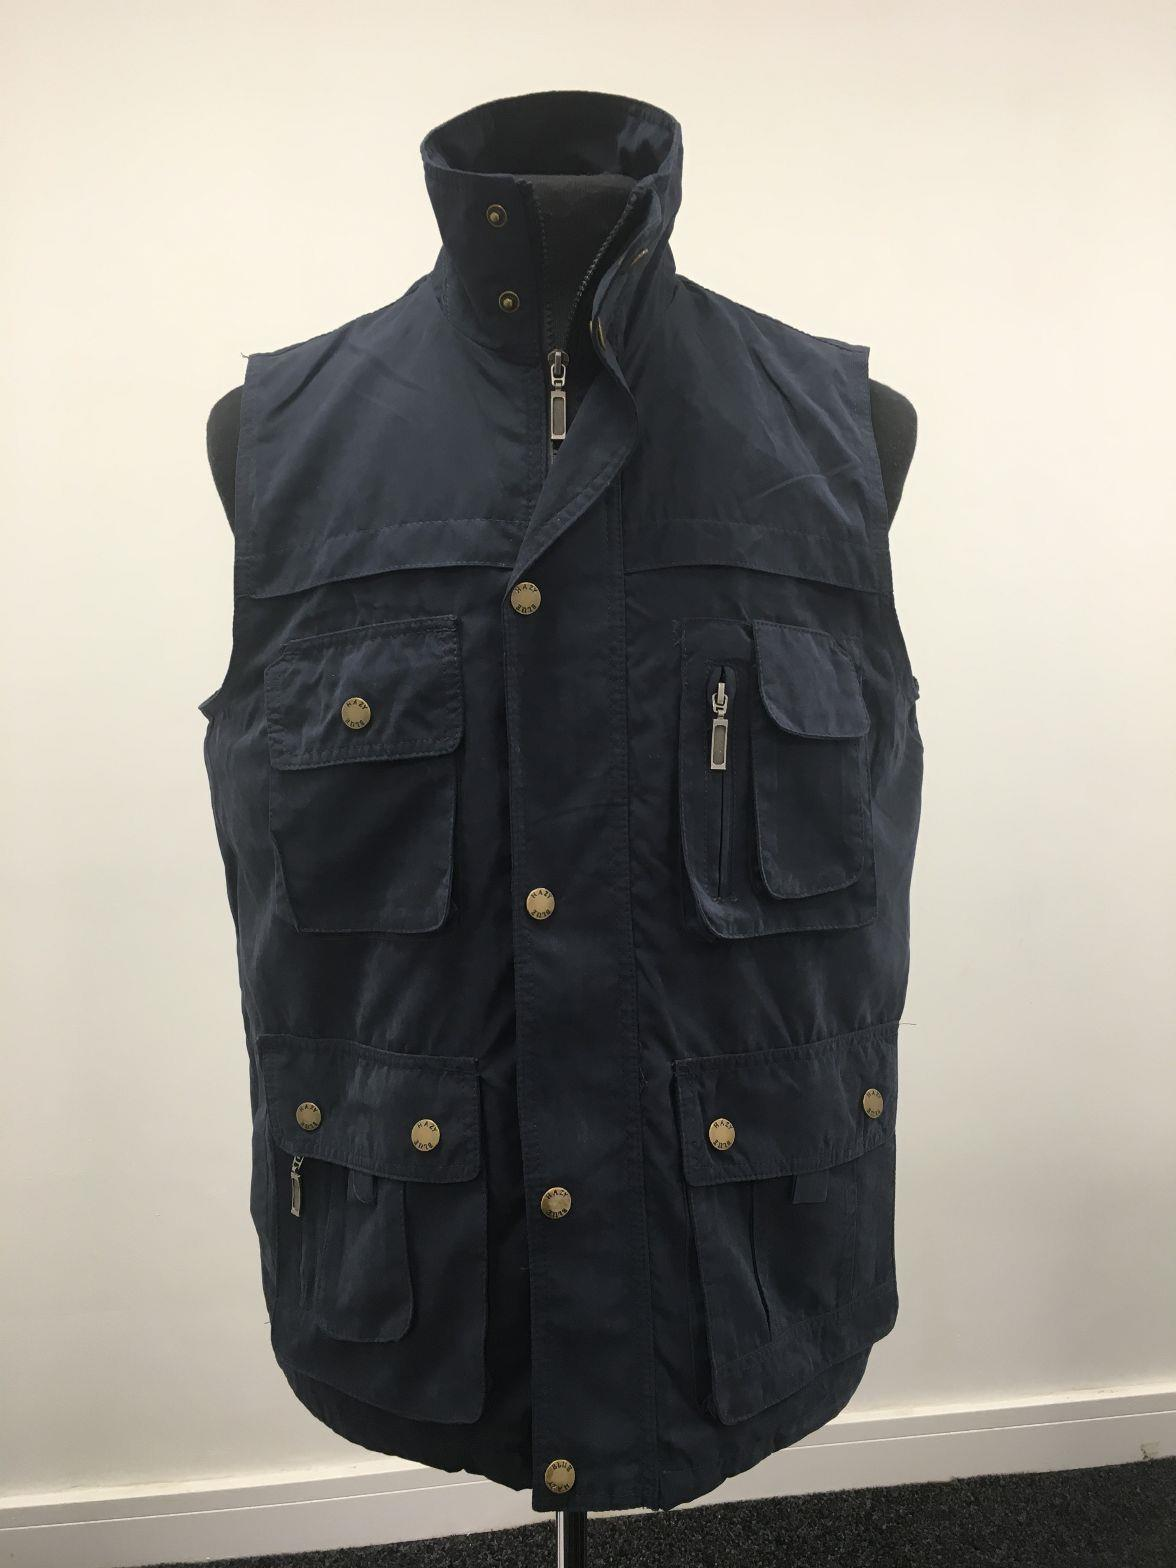 miniatuur 3 - Country Classics HAWK II Mens Padded Gilet Multi Pocket Bodywarmer Utility Vest